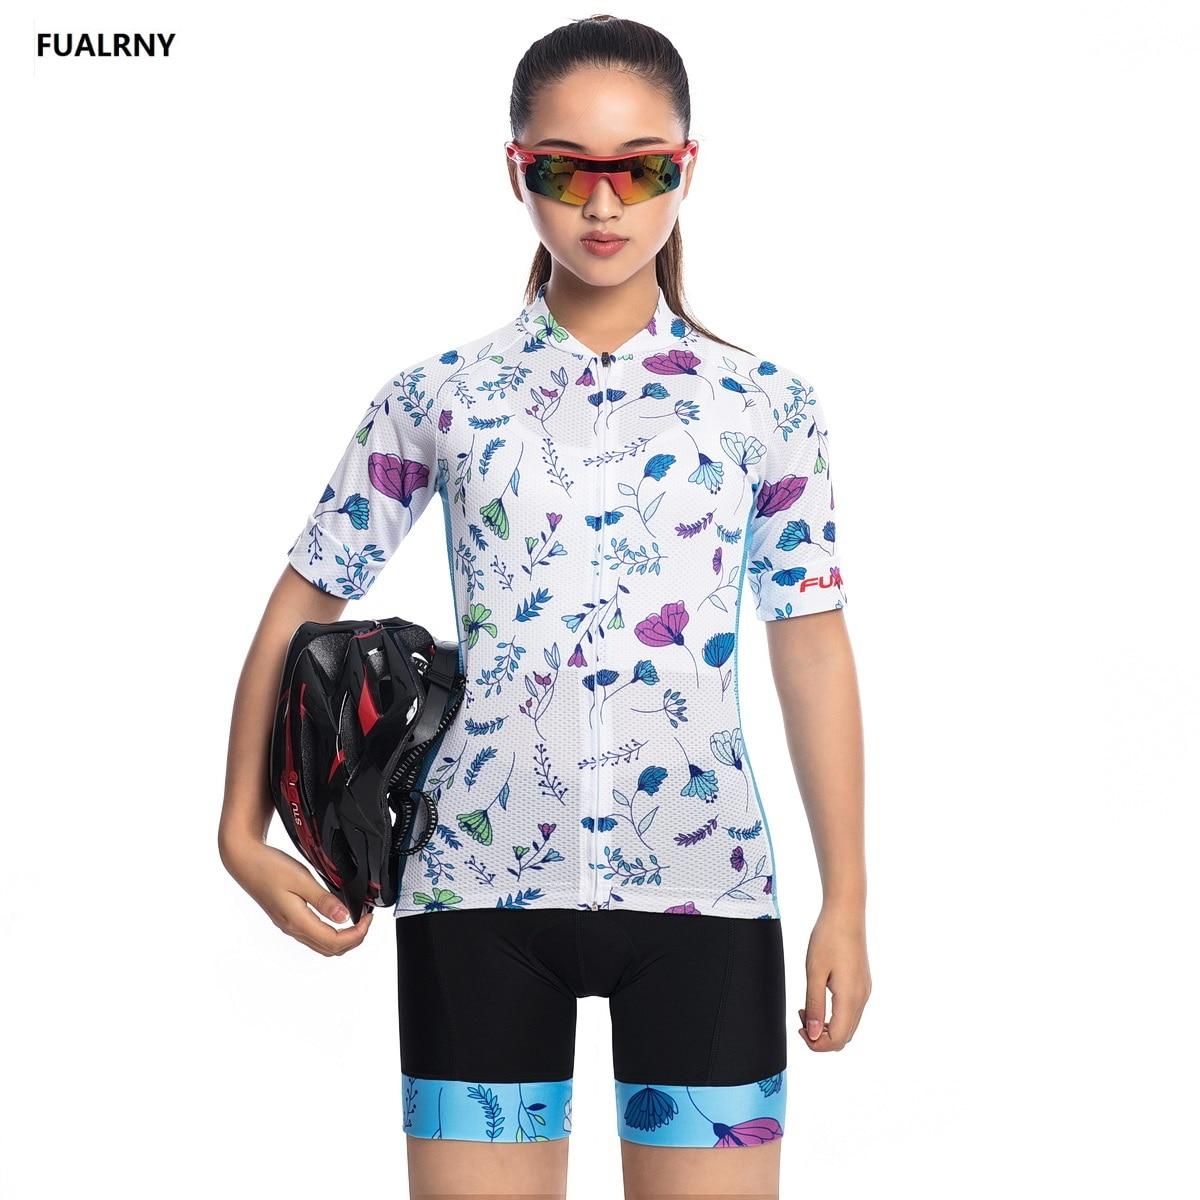 2018 FUALRNY NEW Pro Thin short Cycling jersey Sets Women Sportswear Mtb Bike Bicycle Padded Cycling Clothing Plant elements